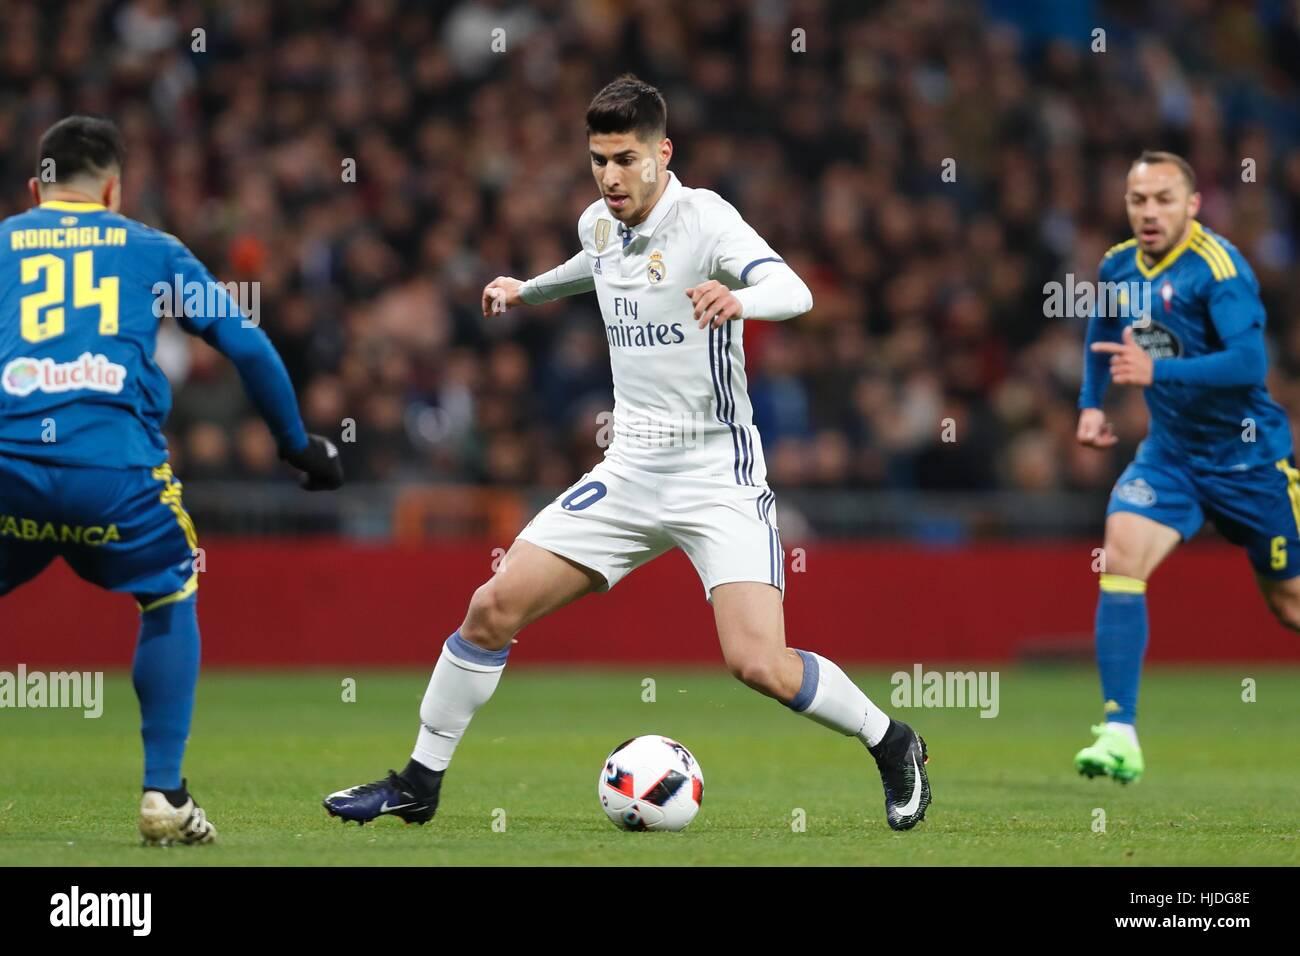 Madrid, Spain. 18th Jan, 2017. Marco Asensio (Real) Football/Soccer ...